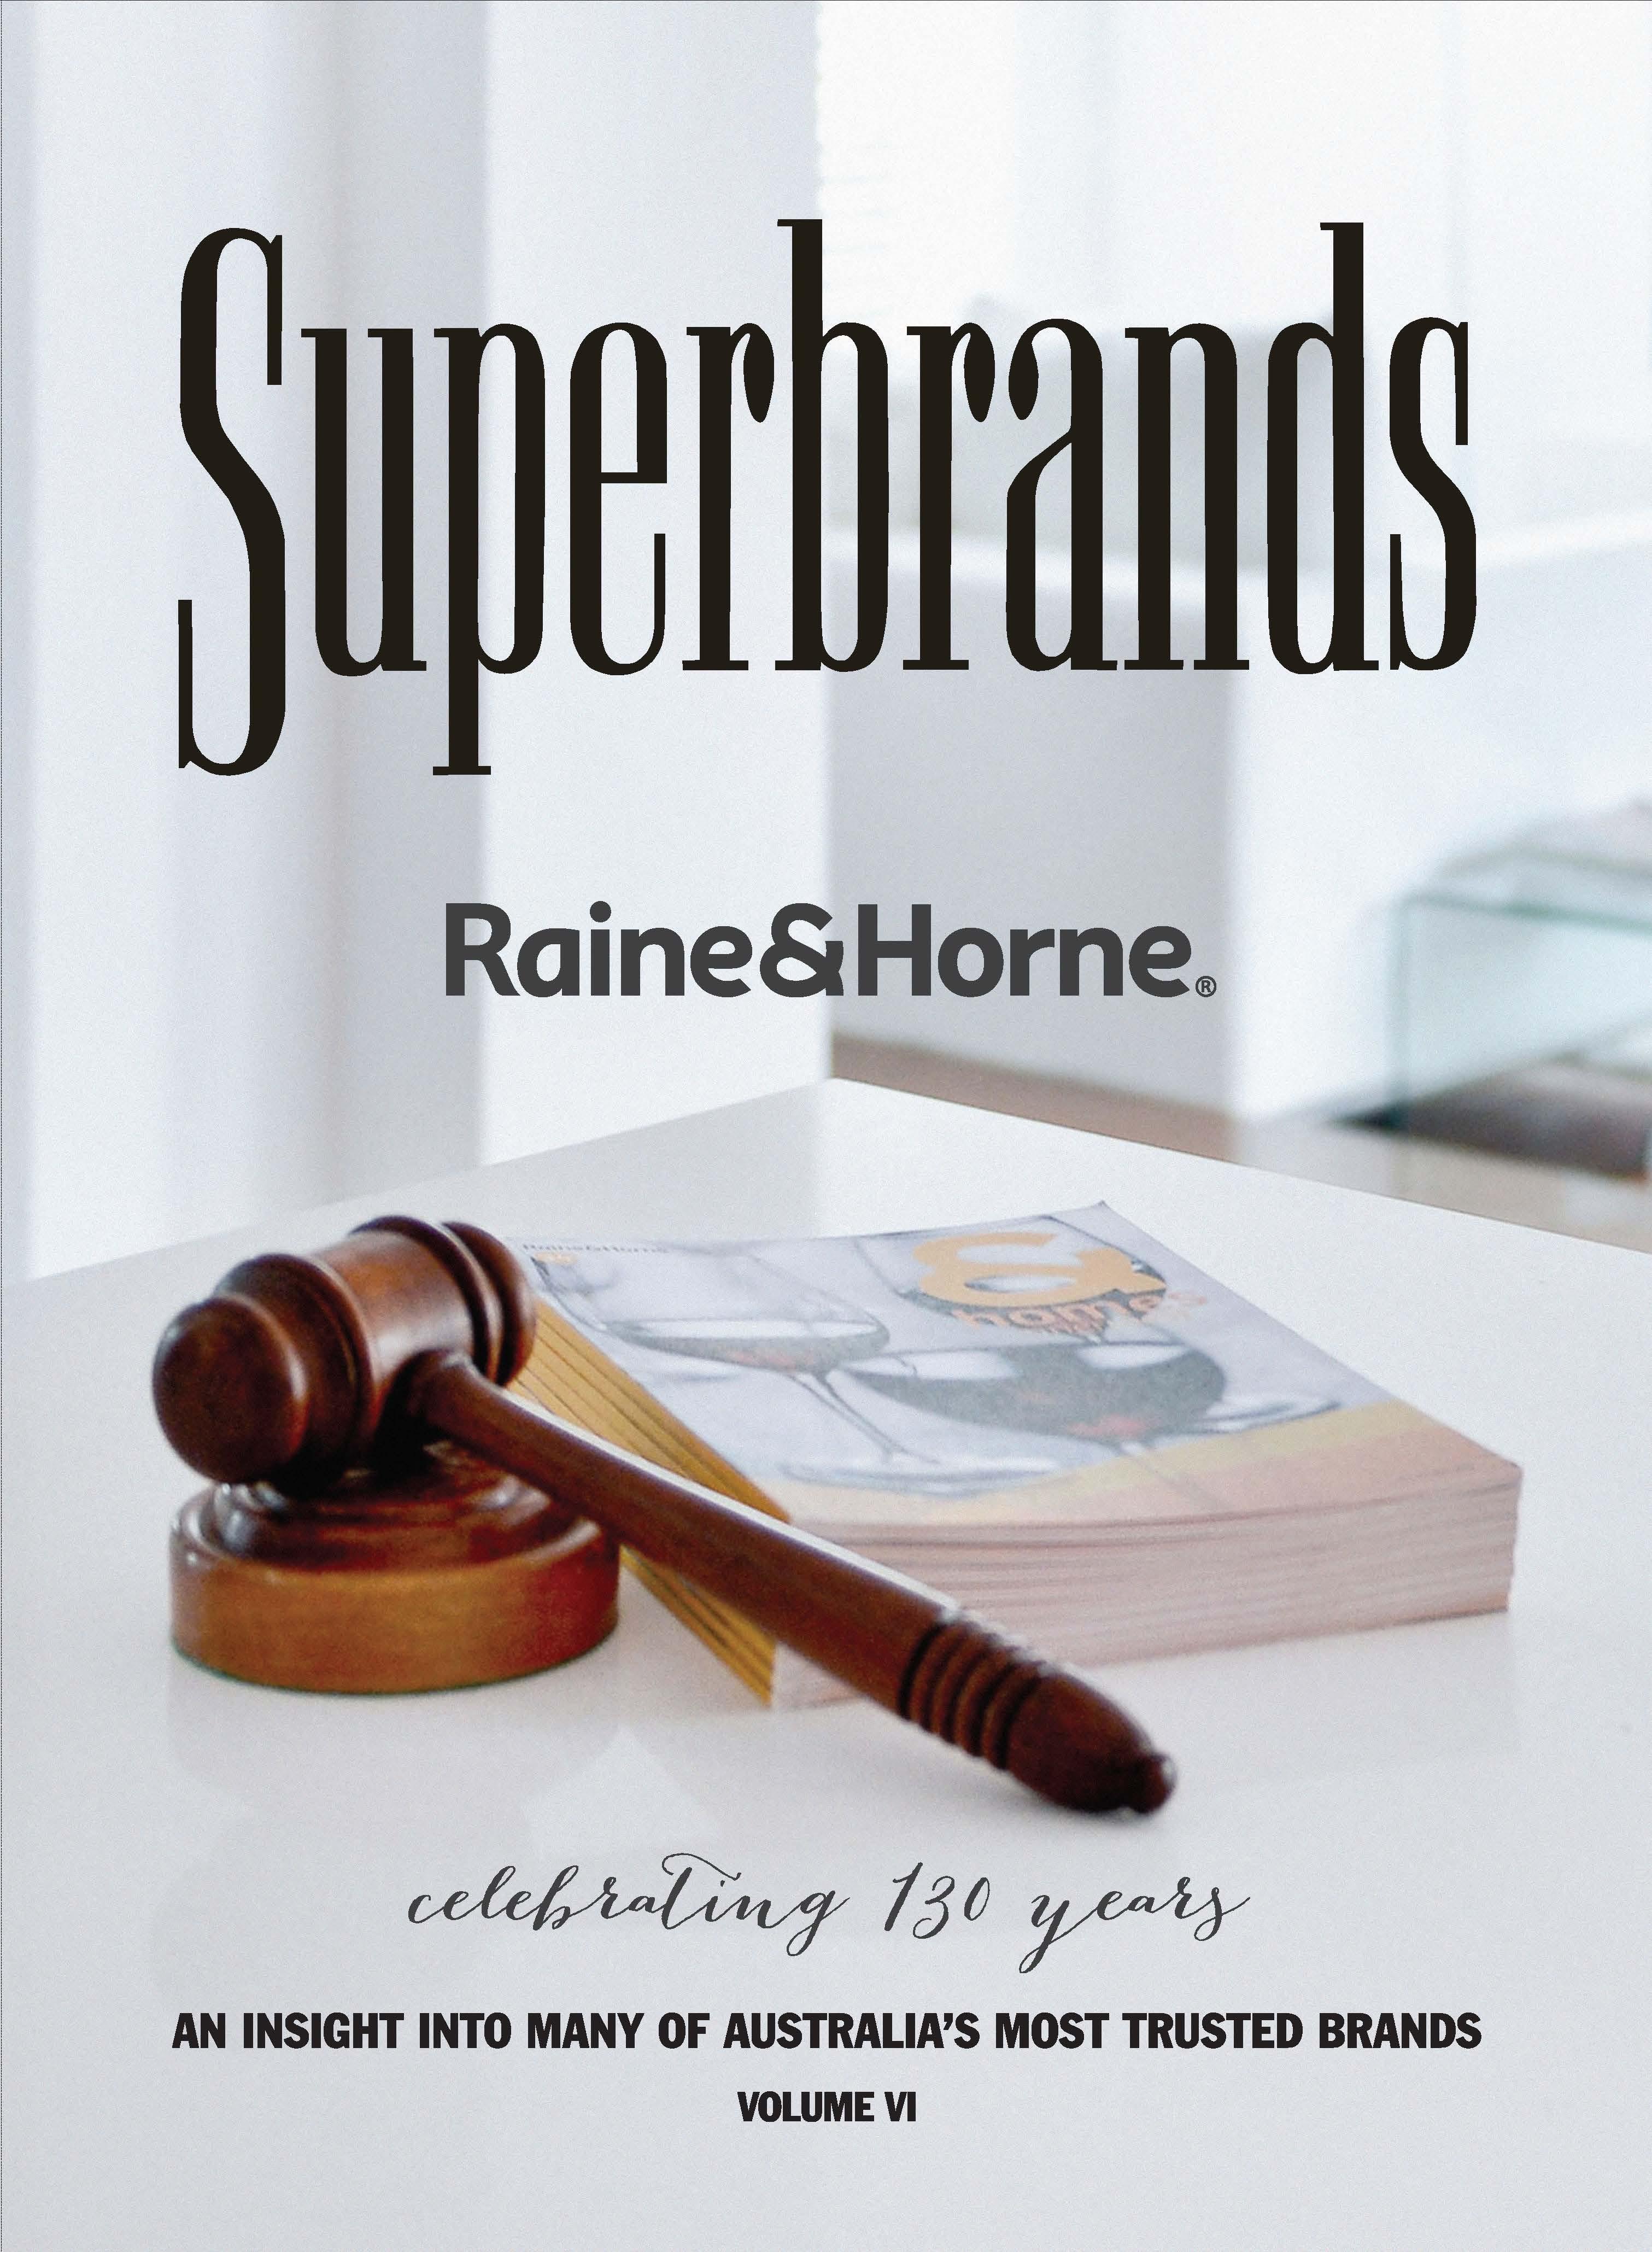 Raine & Horne Superbrands